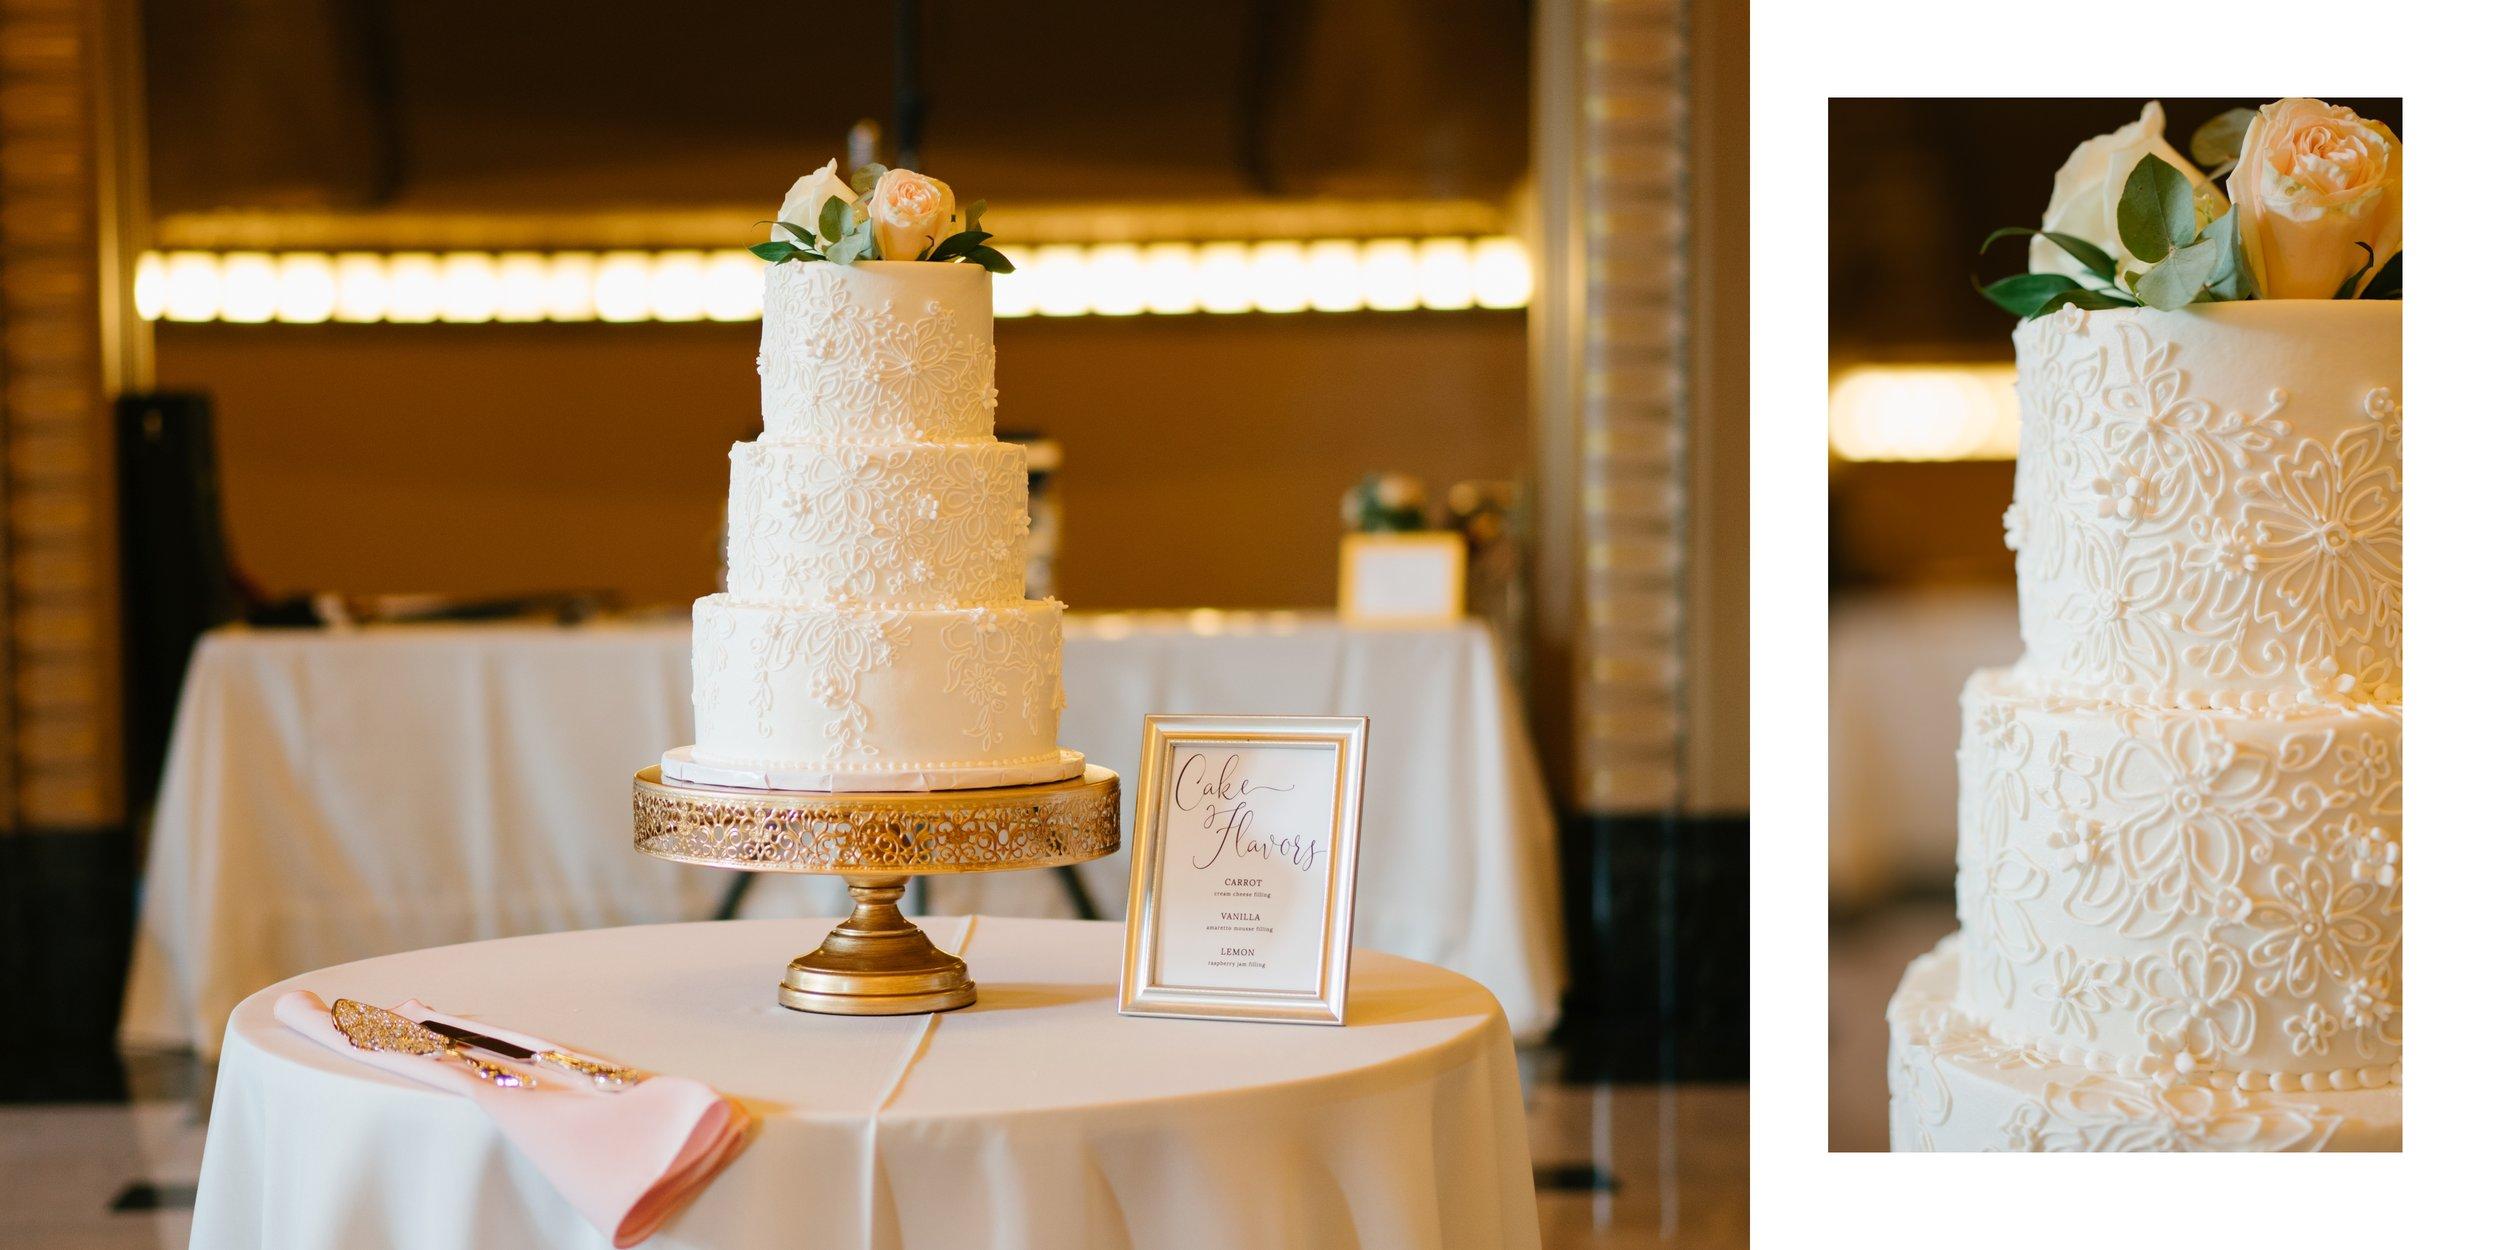 cake at wedding los angeles